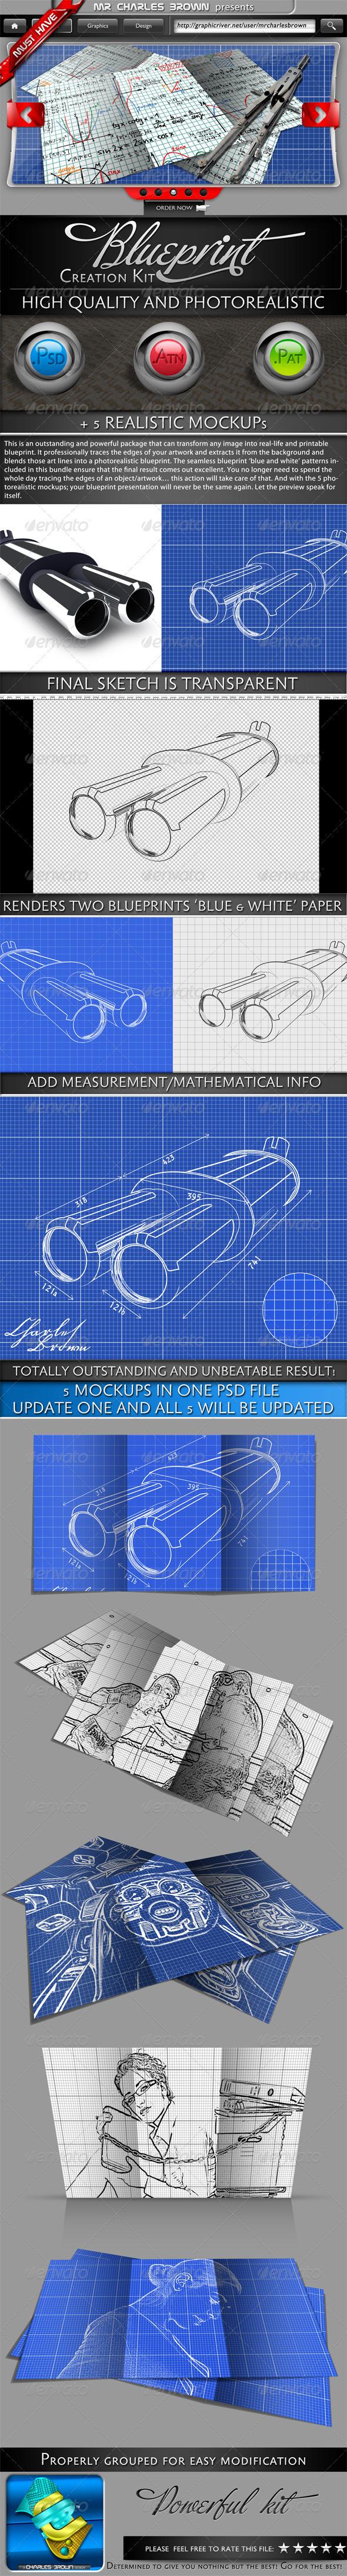 Blueprint Creation Kit - Photoshop Add-ons